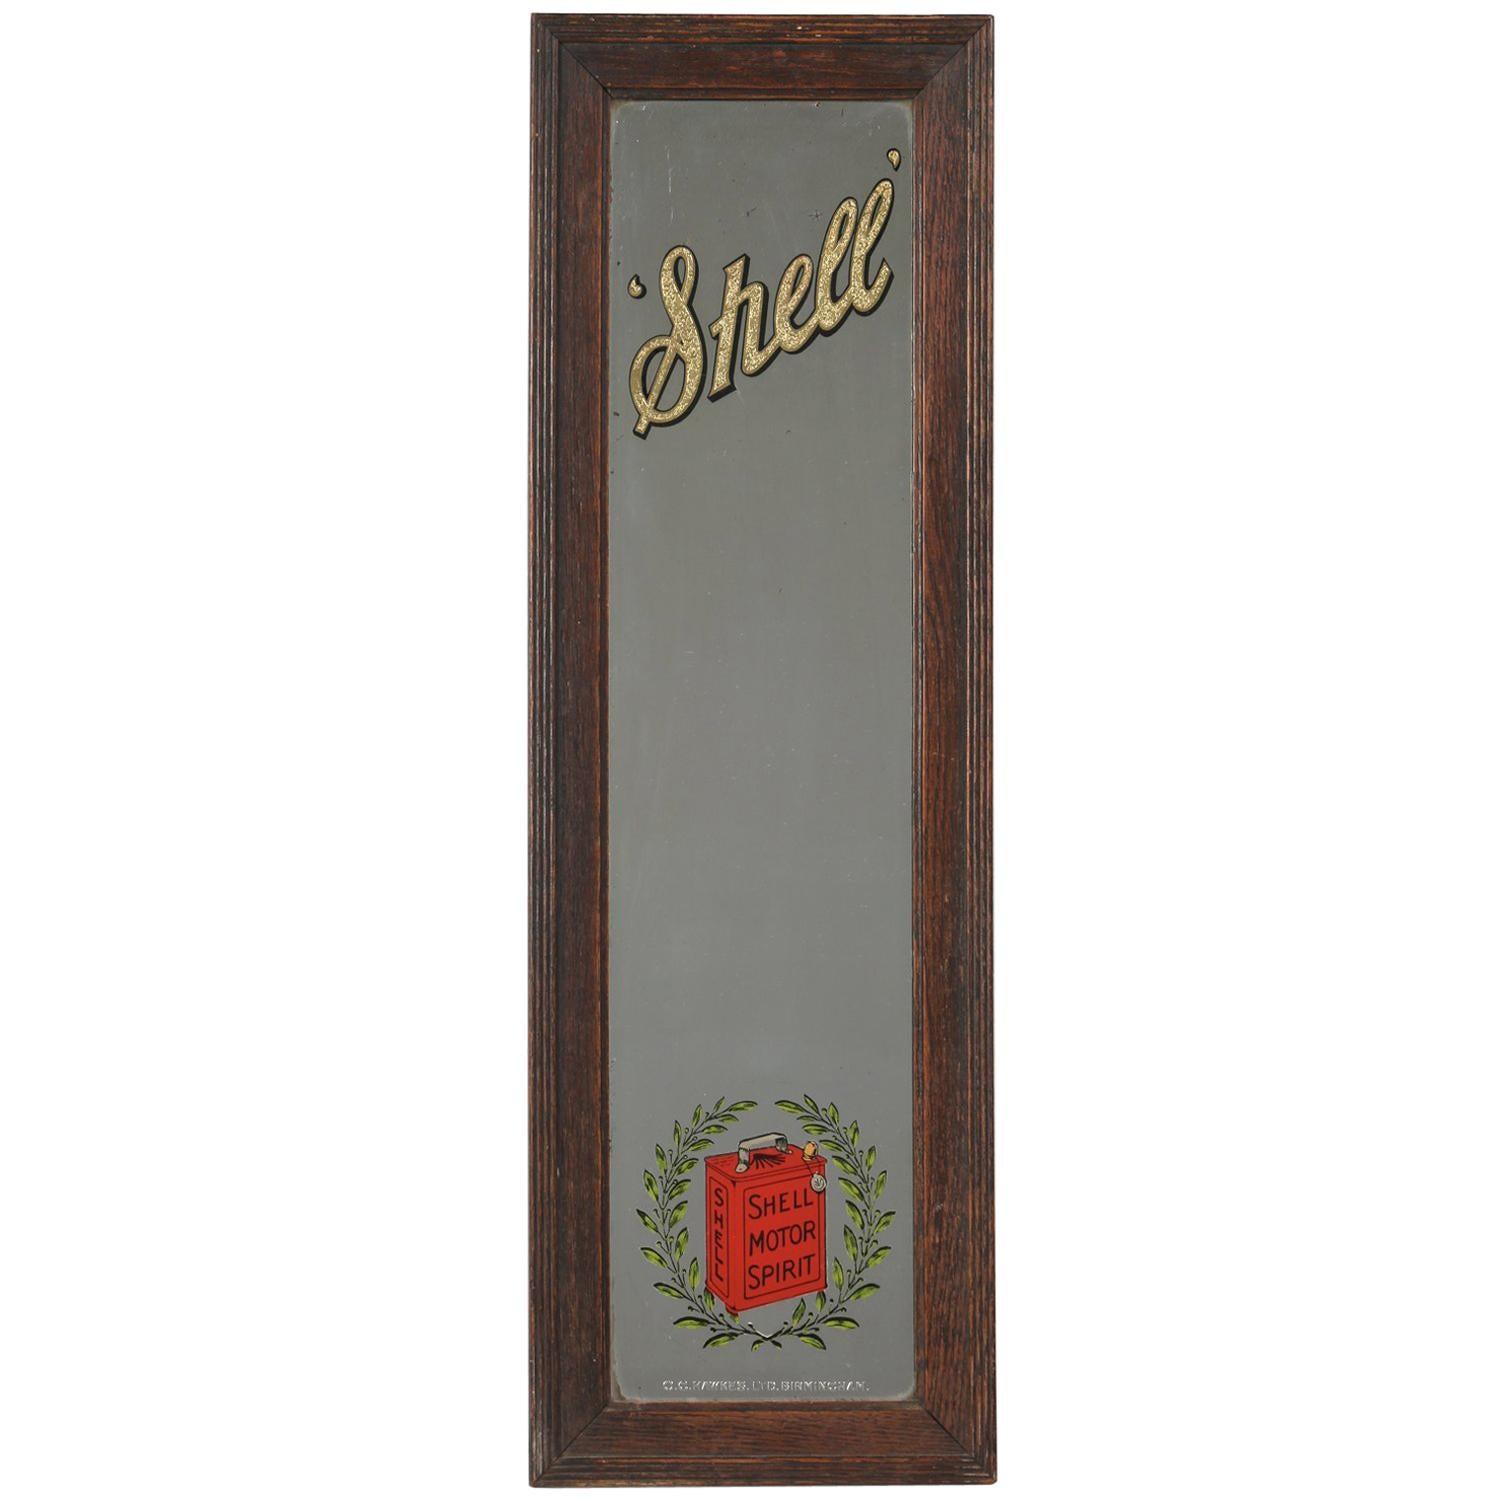 Shell Oil Advertising Mirror, circa 1930s